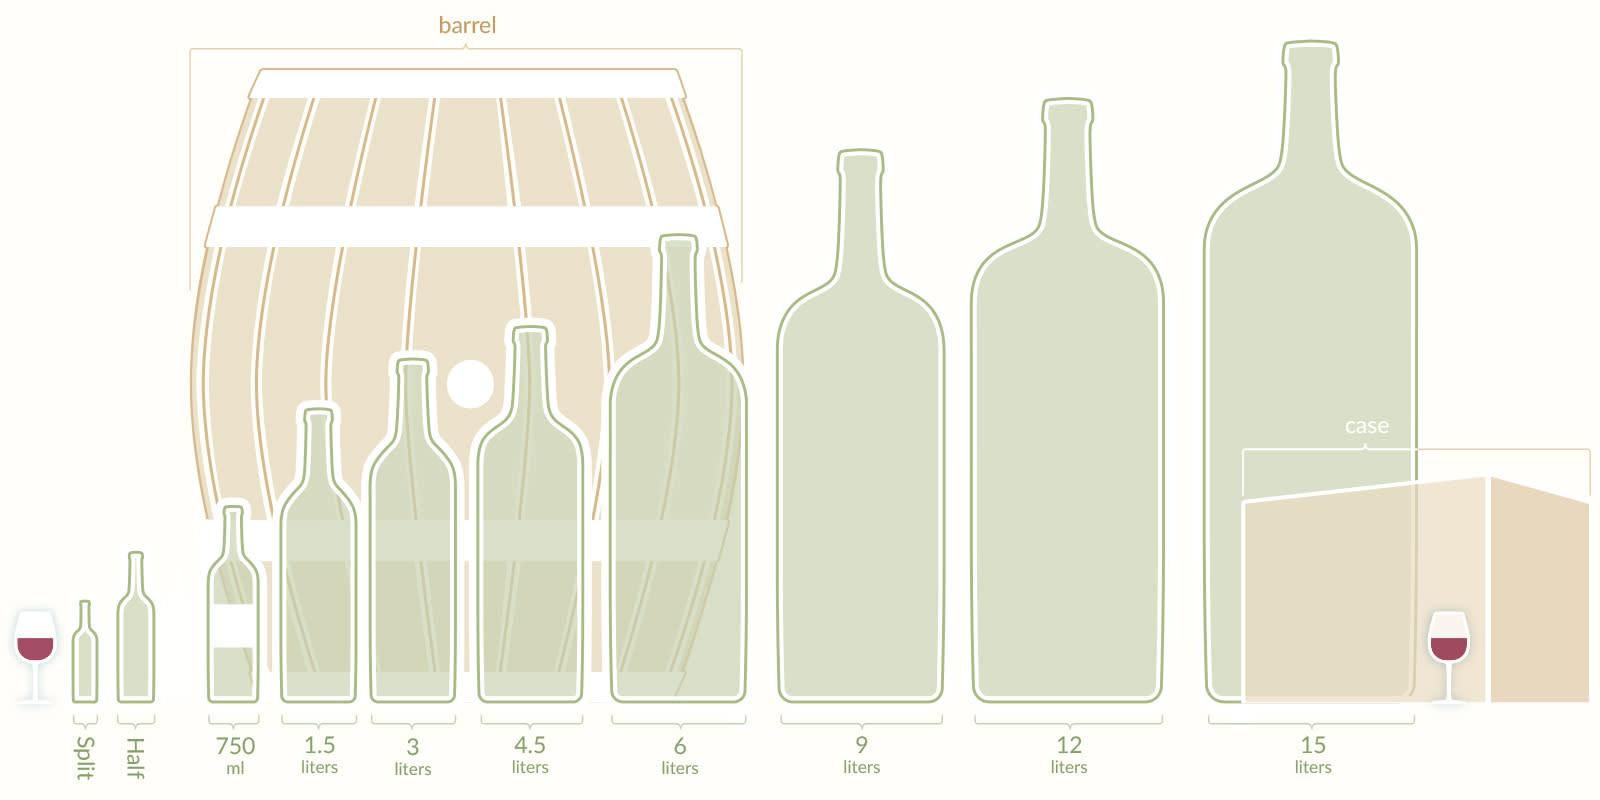 Wine bottle, barrel, case sizes graphic